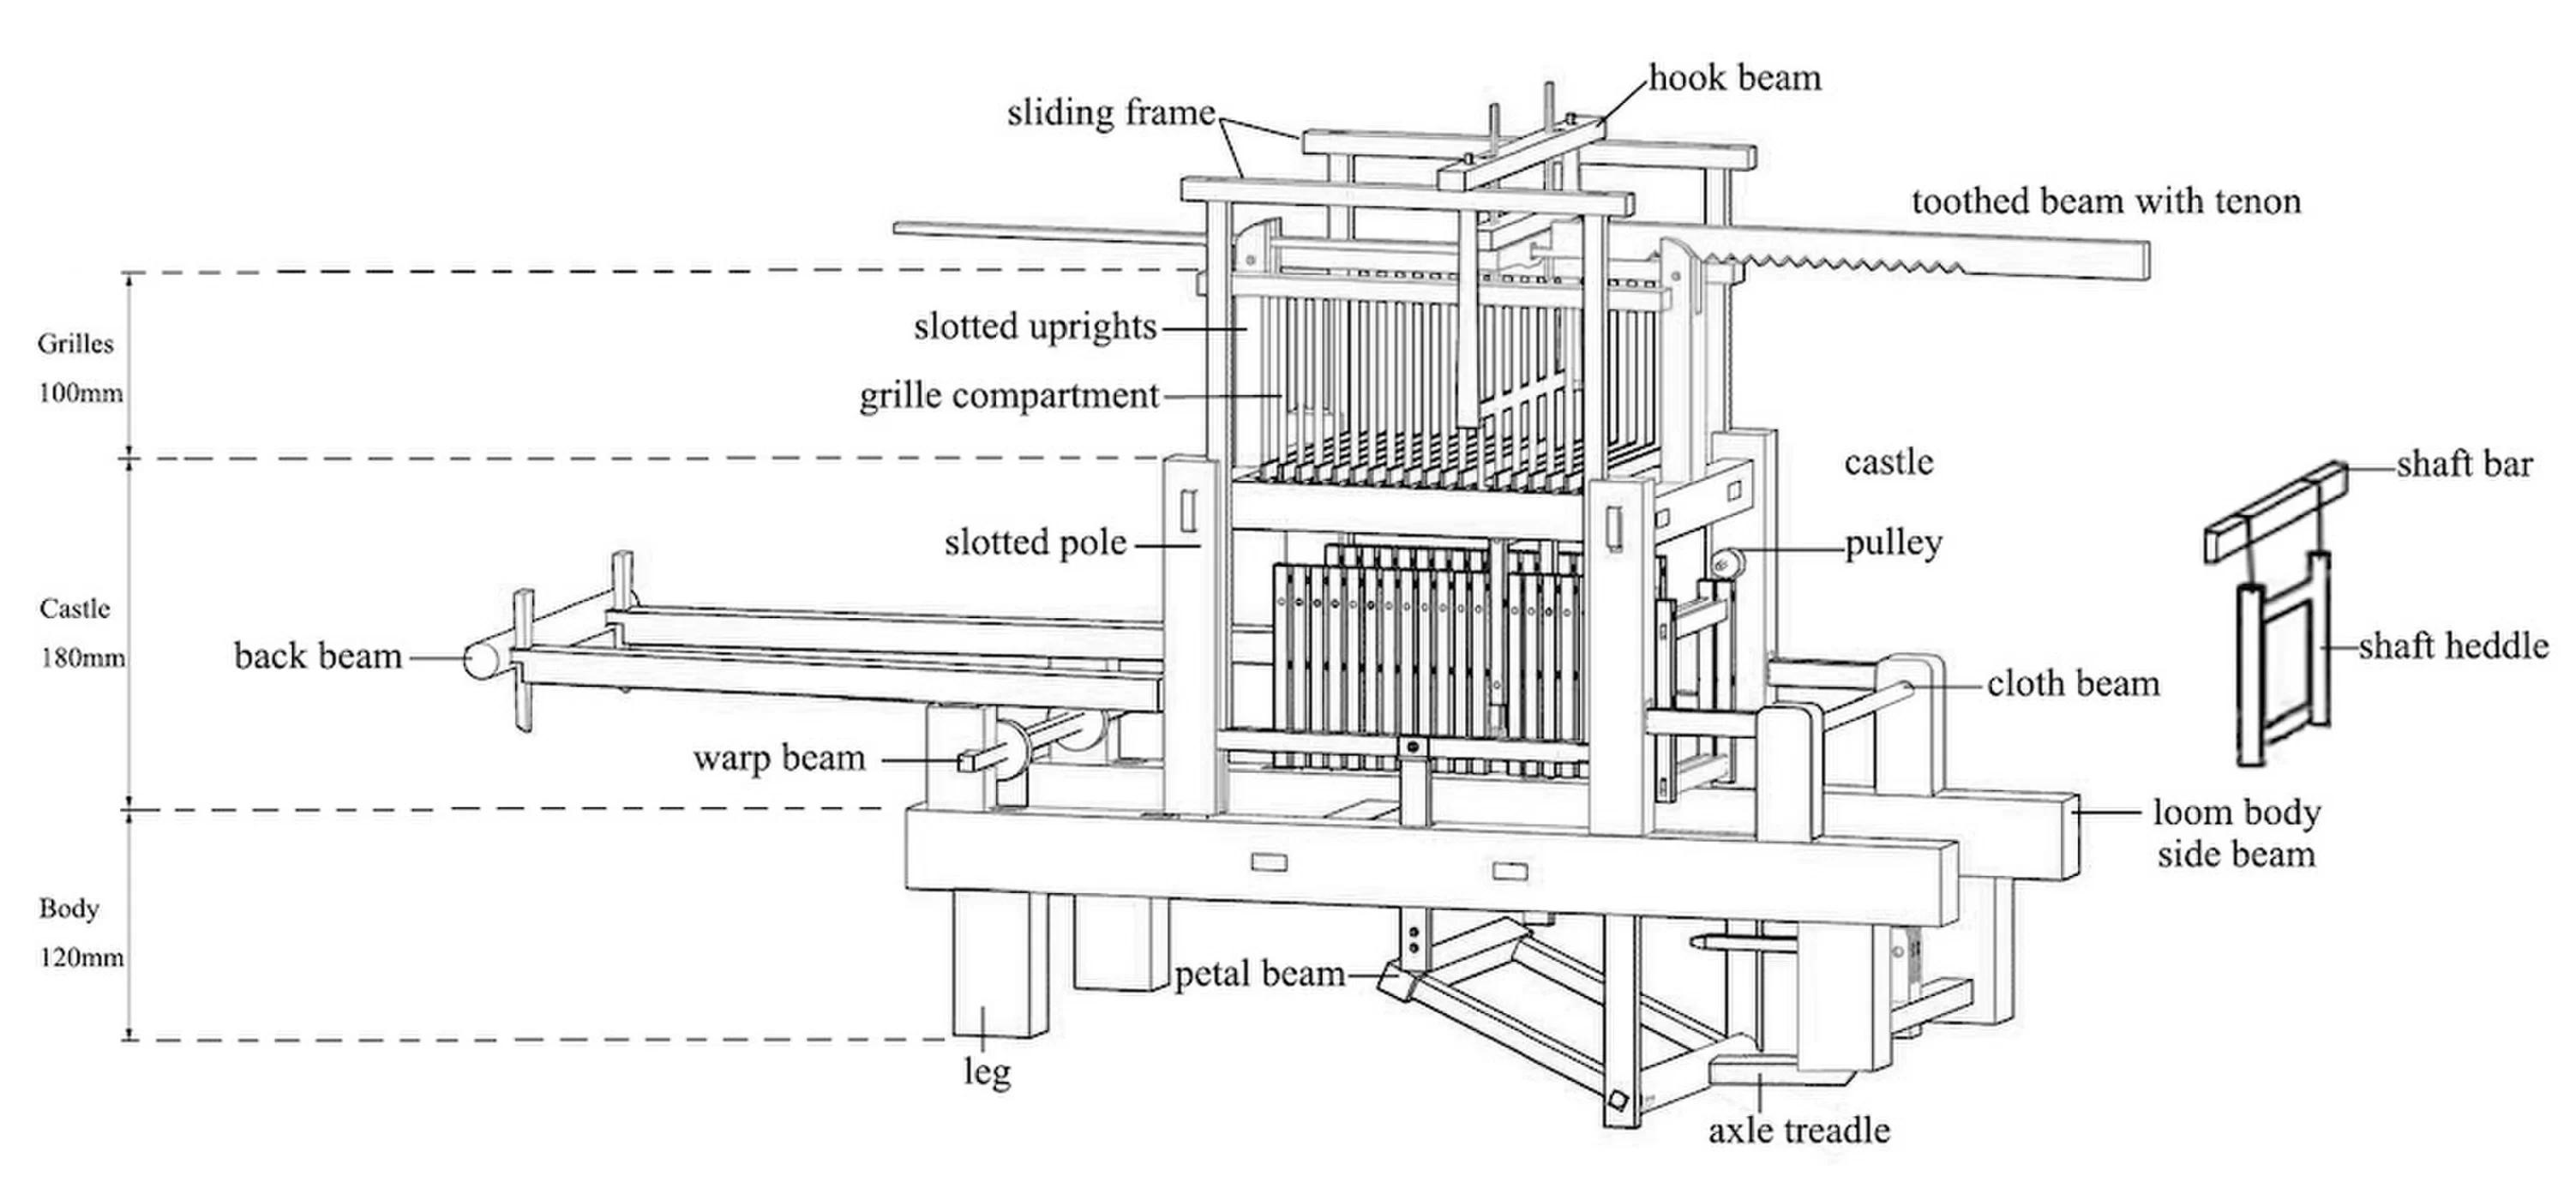 diagram of weaving loom electrical wiring symbols australia the history blog